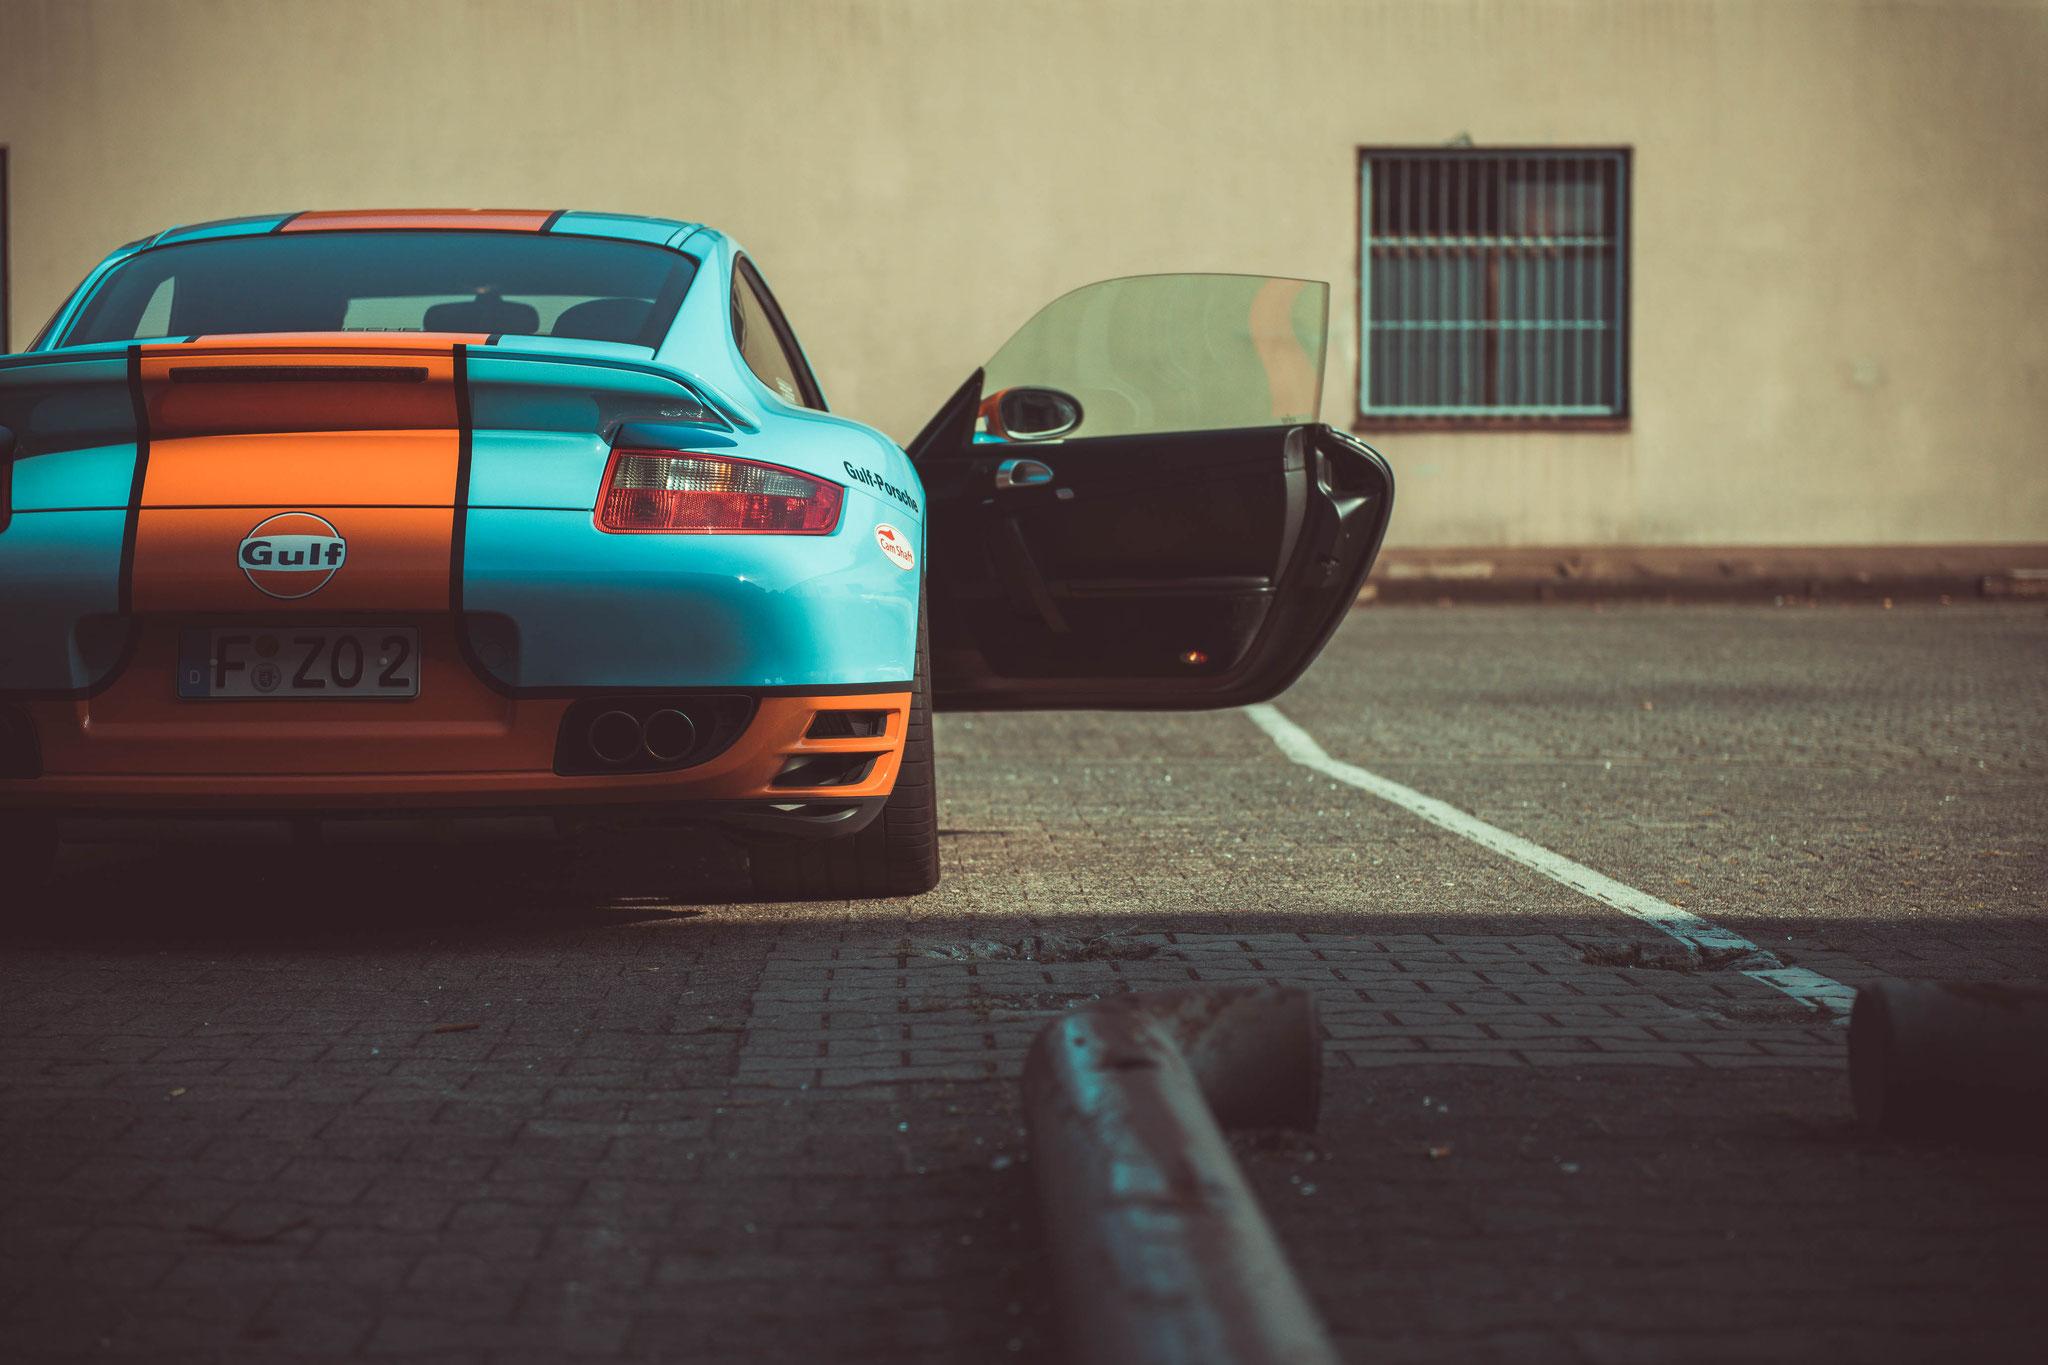 Porsche 997 Turbo - 800 Nm